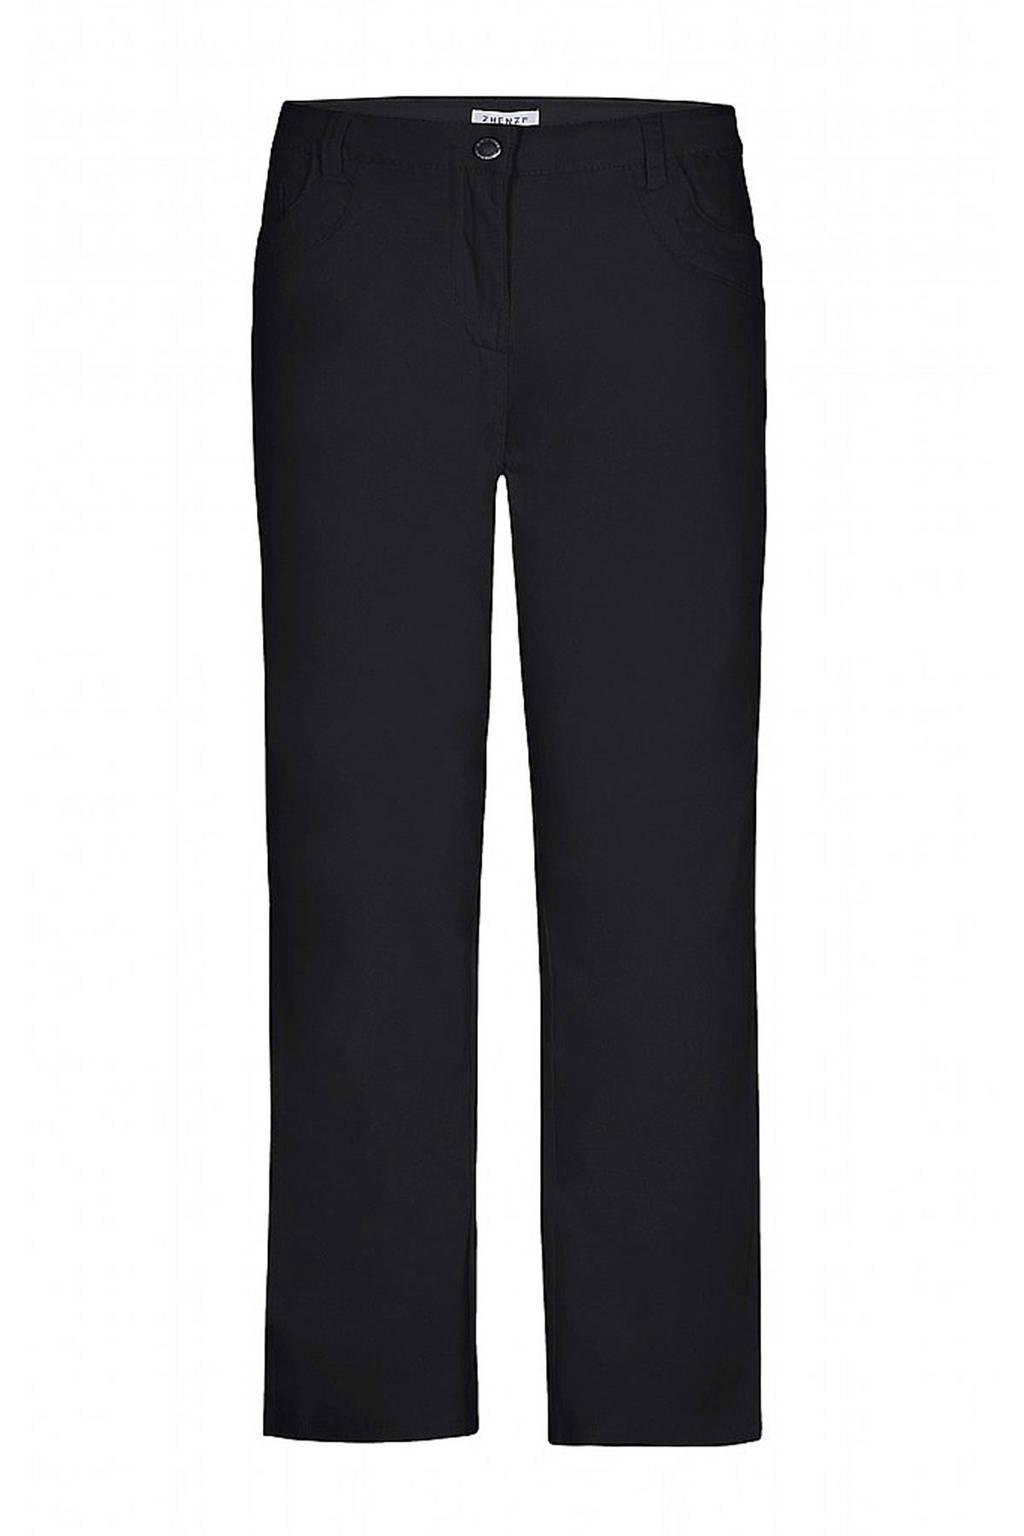 Zhenzi straight fit jeans STEP 82, Zwart